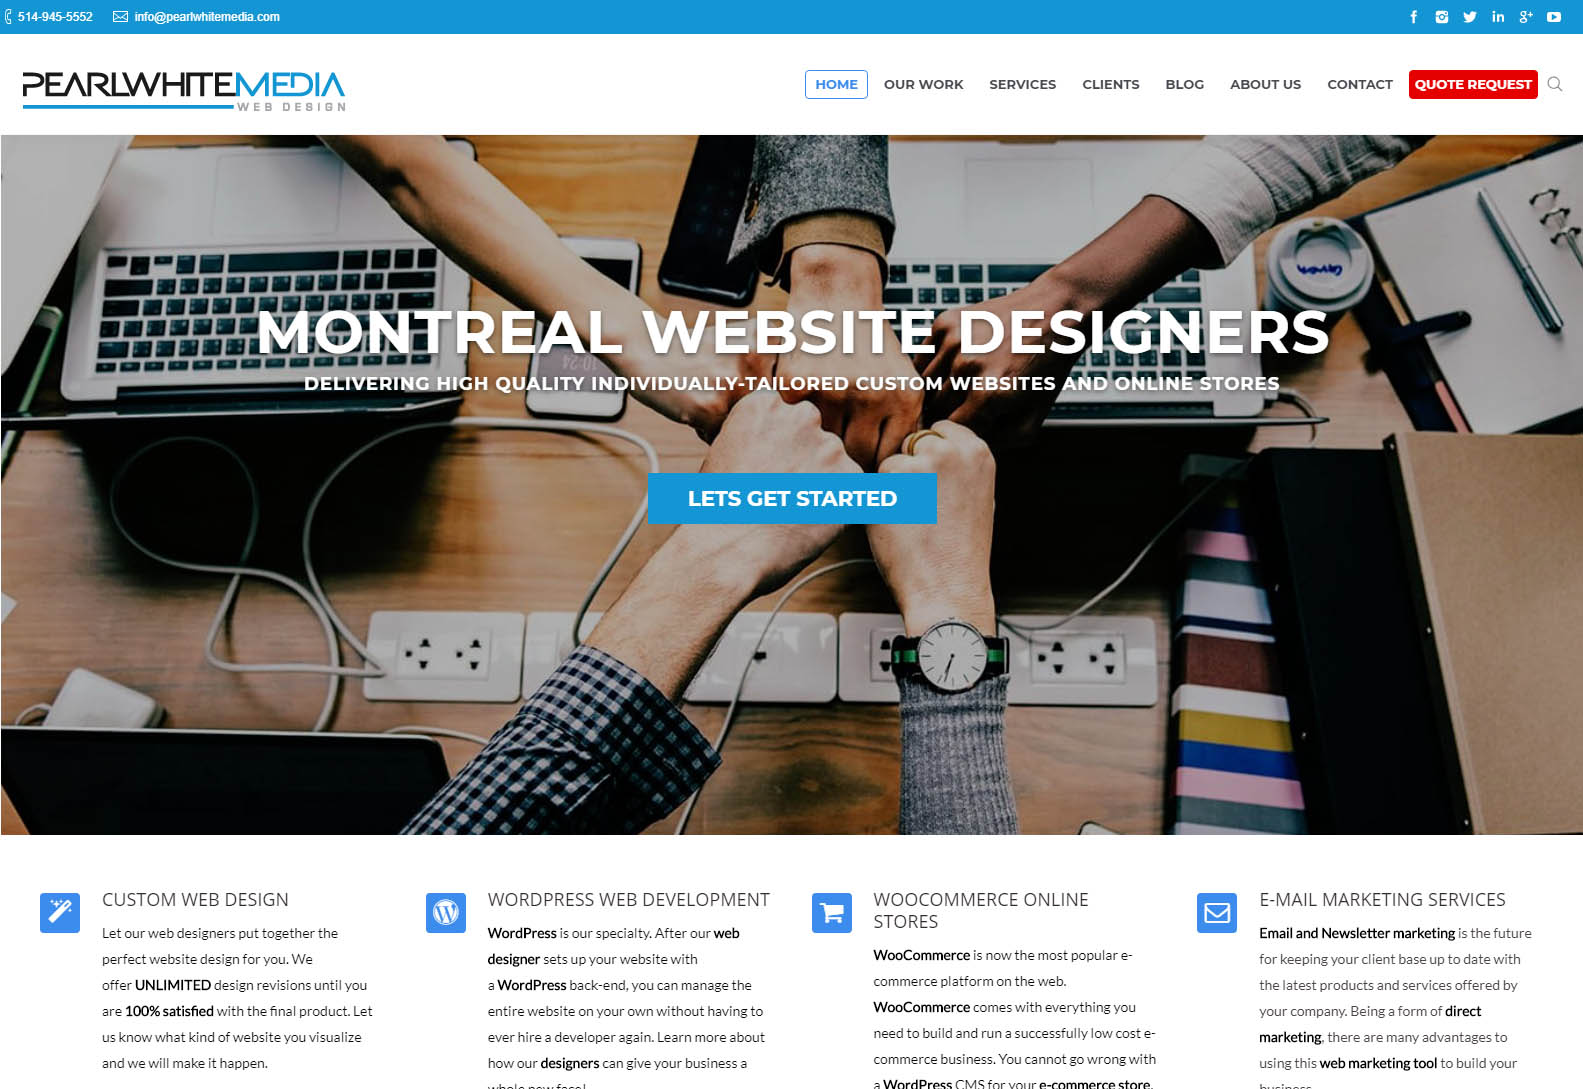 Pearl White Media - Web design agencies Montreal